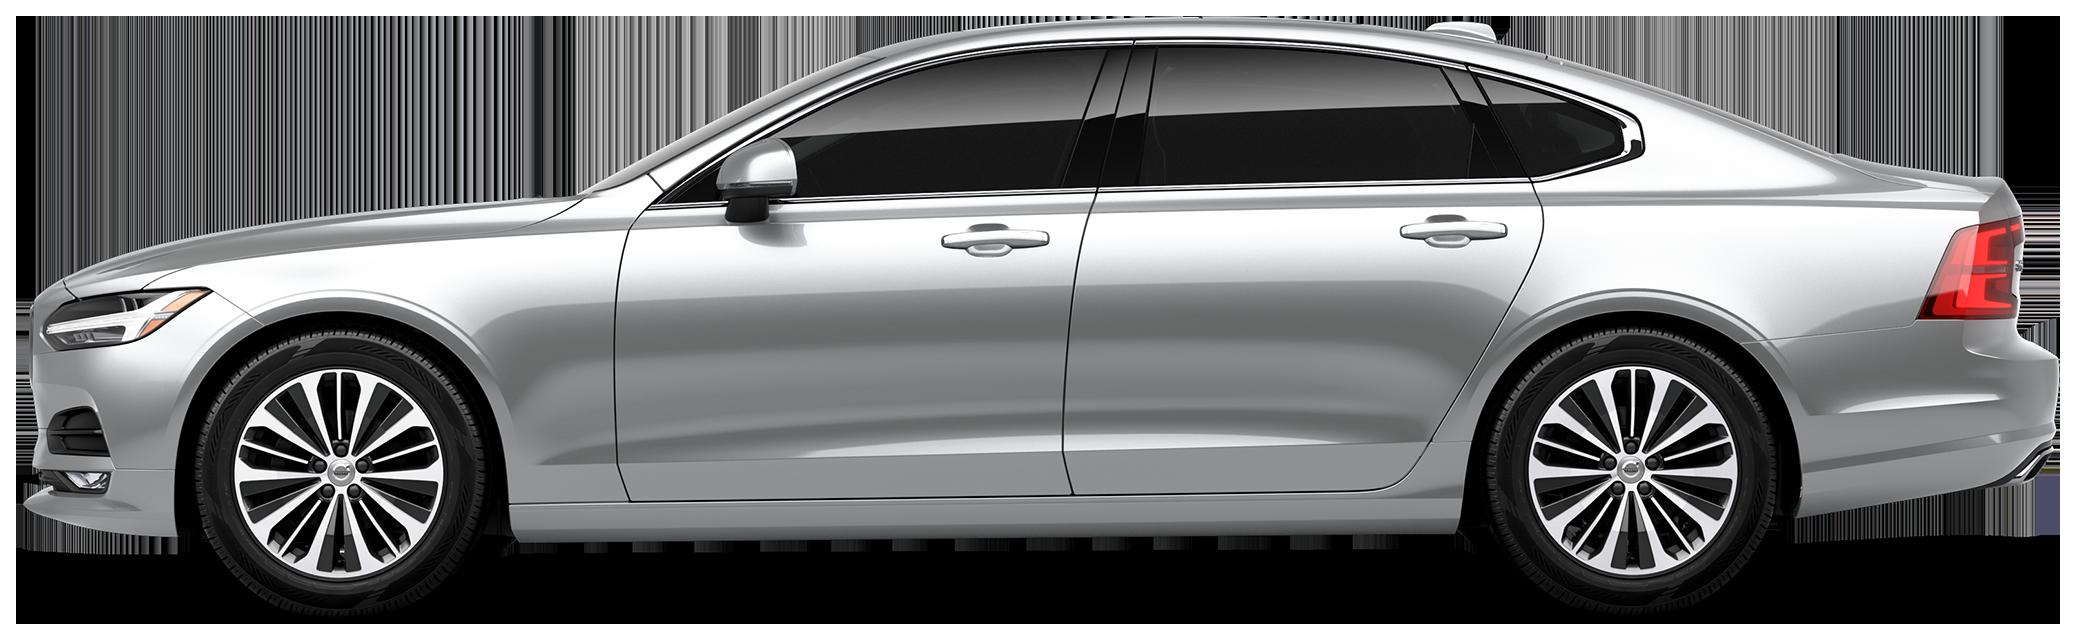 2020 Volvo S90 Sedan T6 Momentum